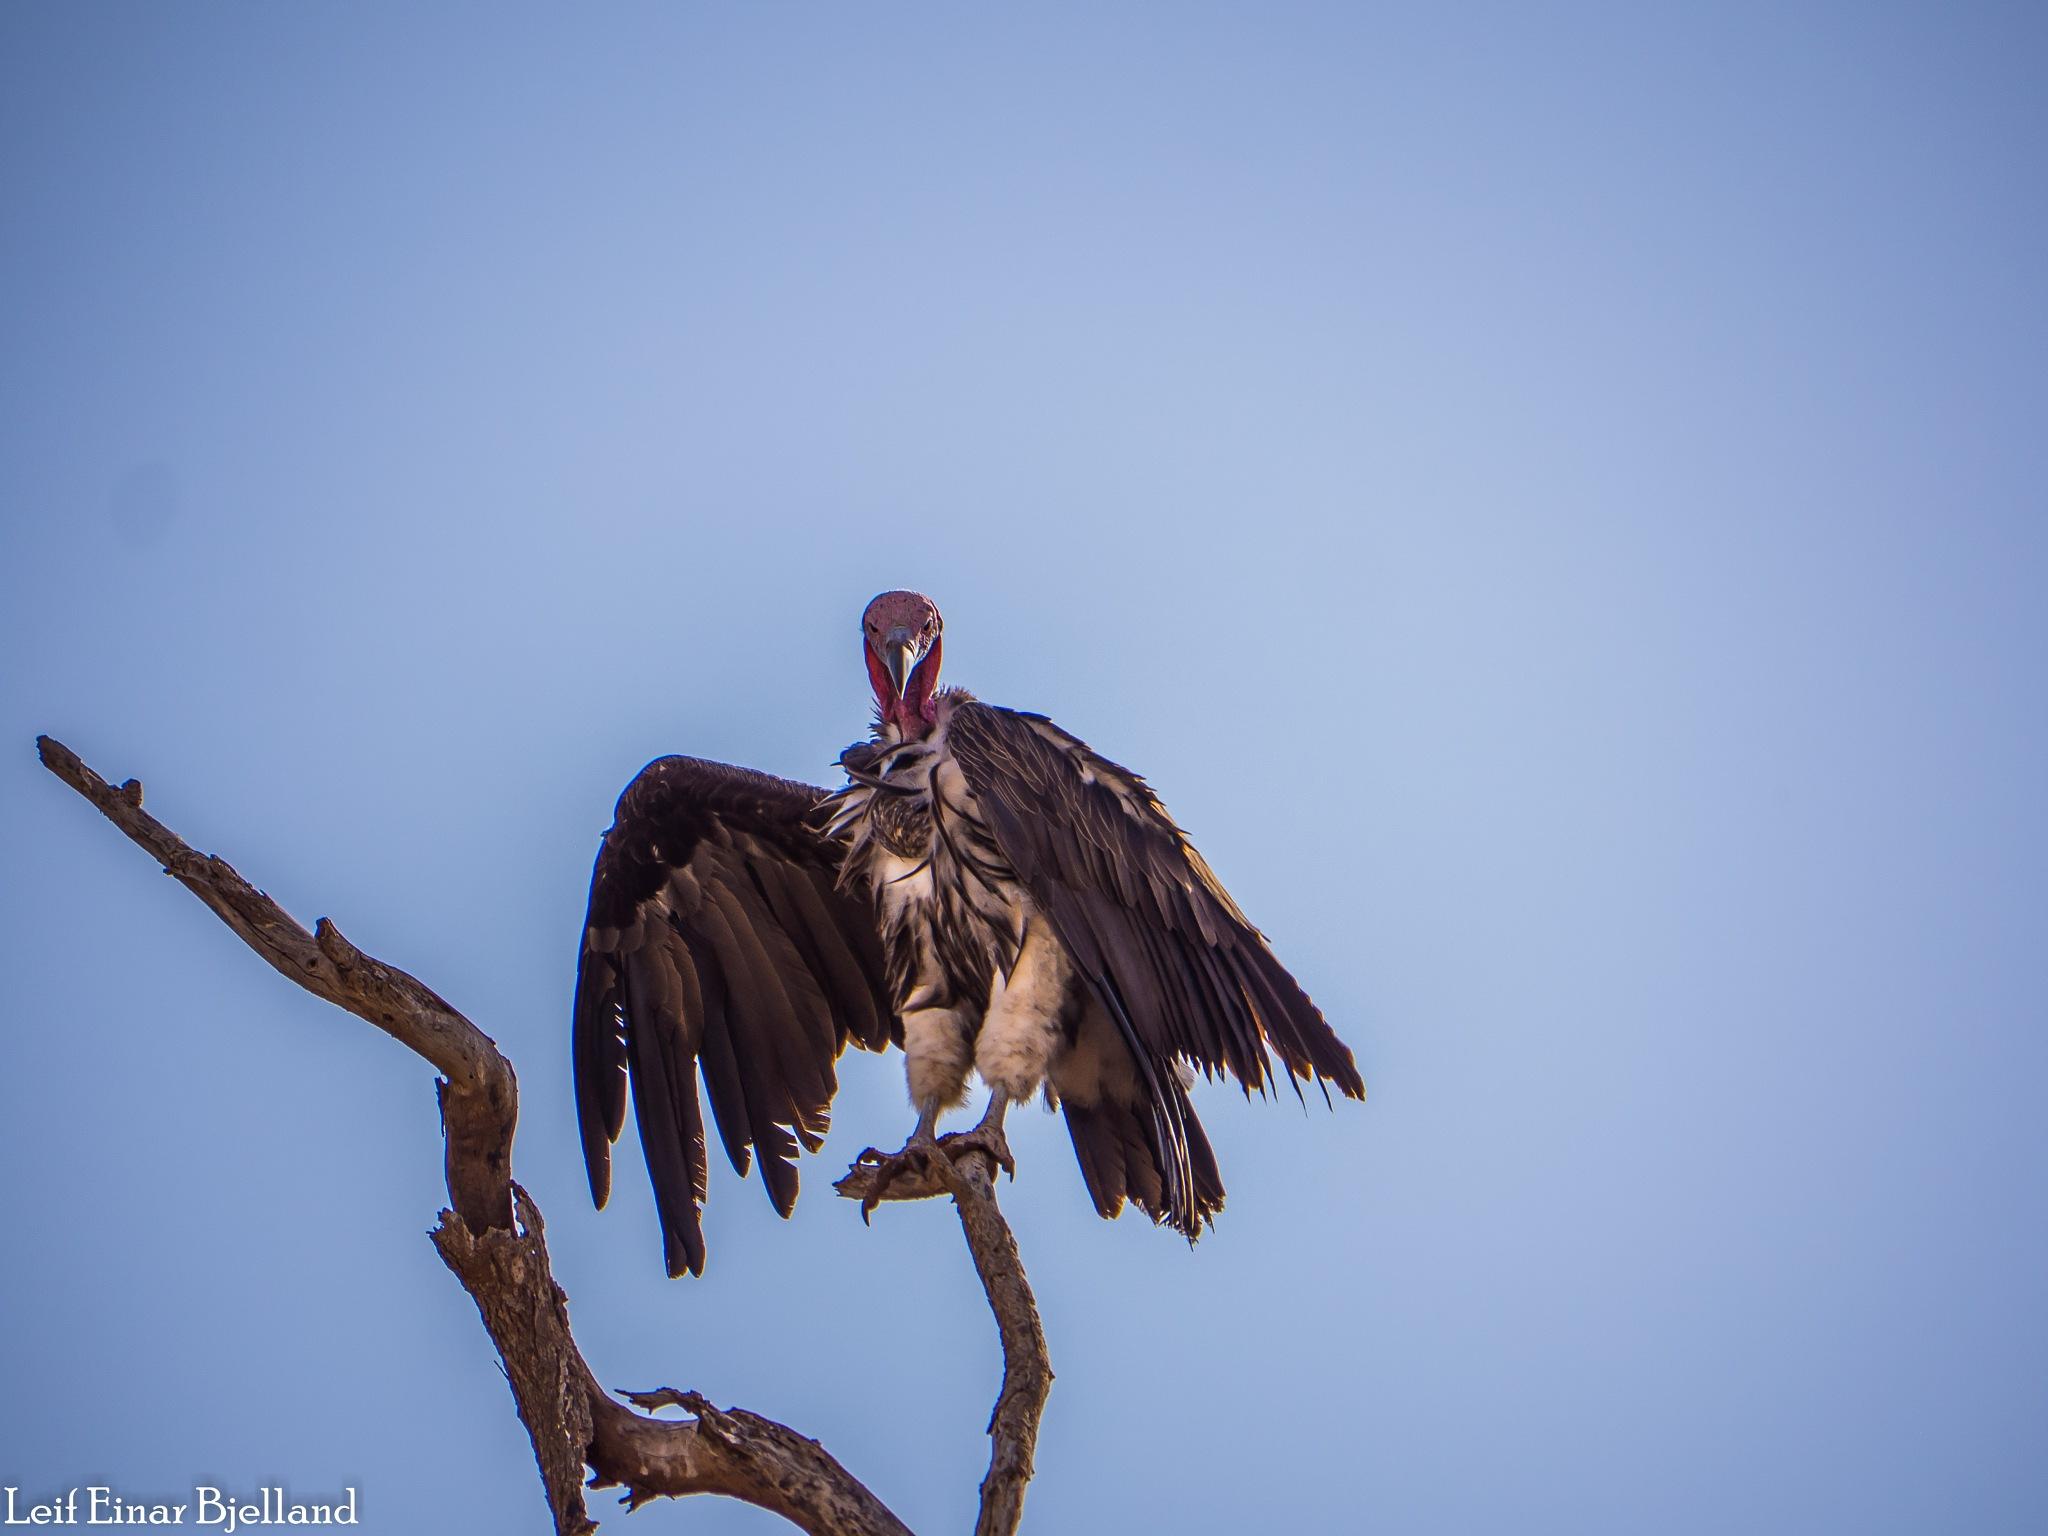 Vulture by Leif Einar Bjelland